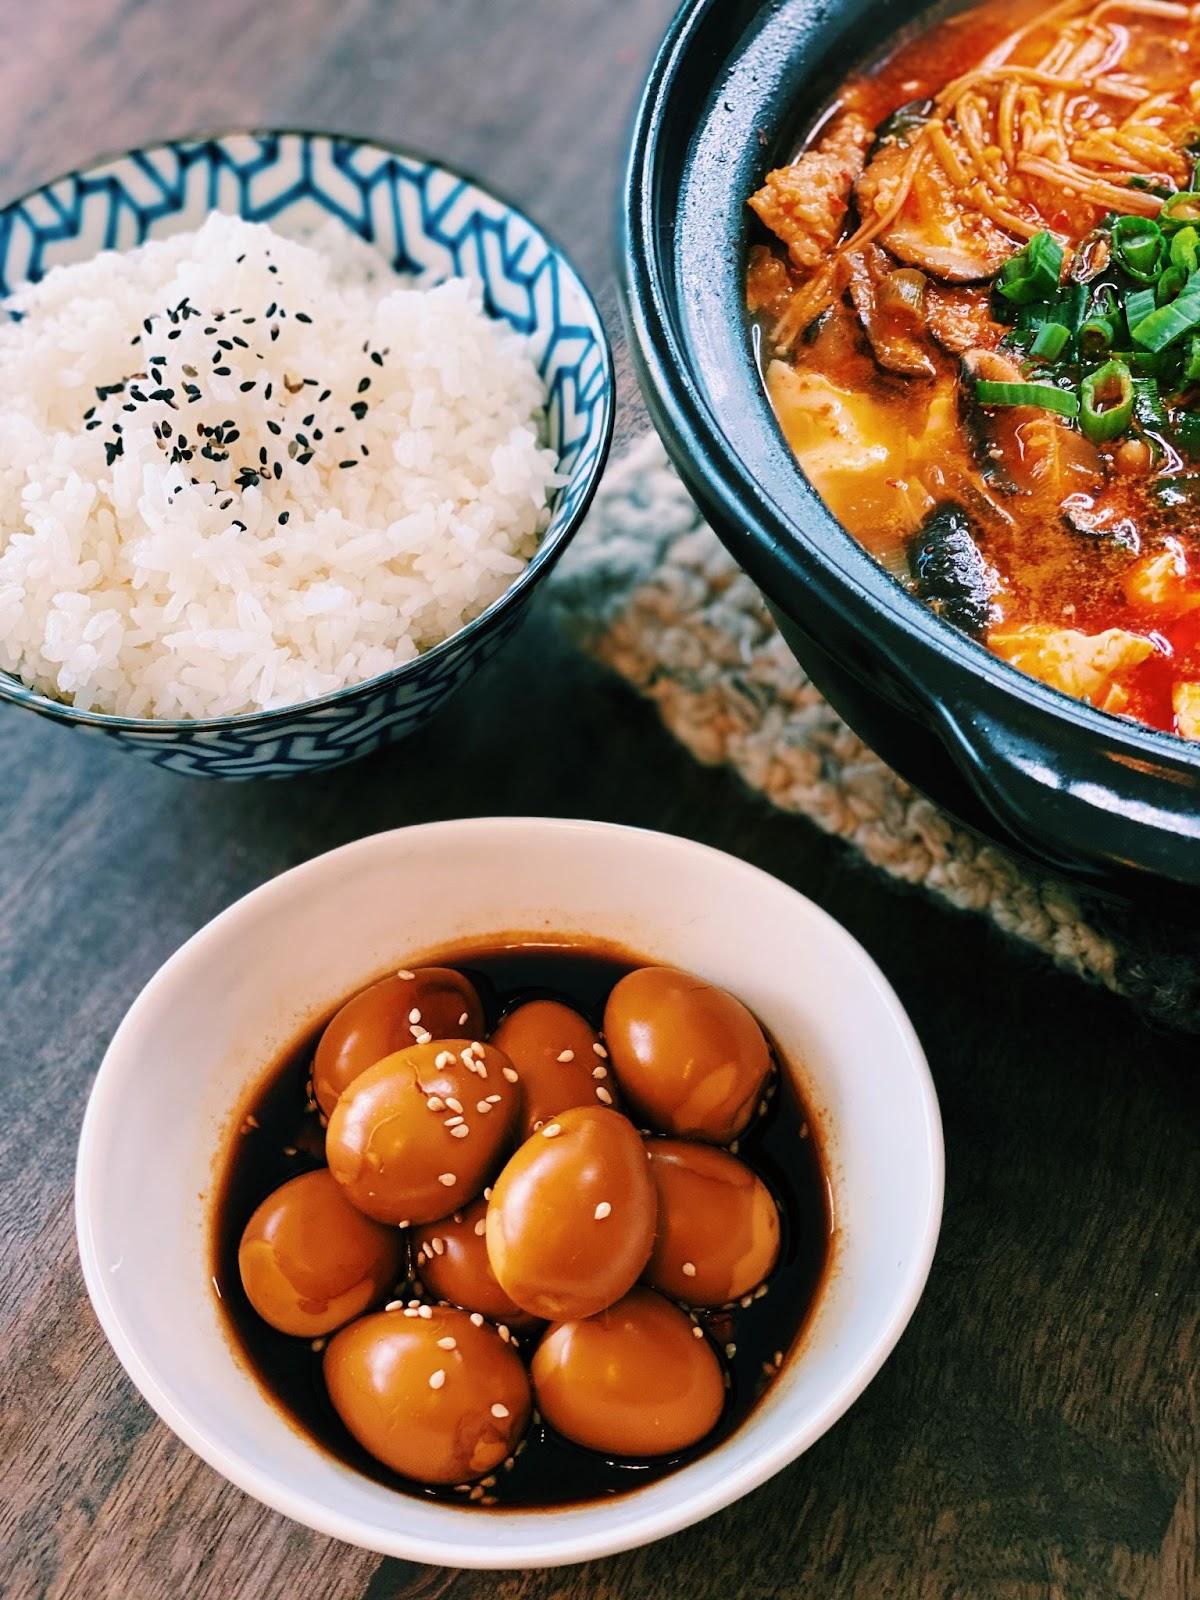 How to make Korean Food at home